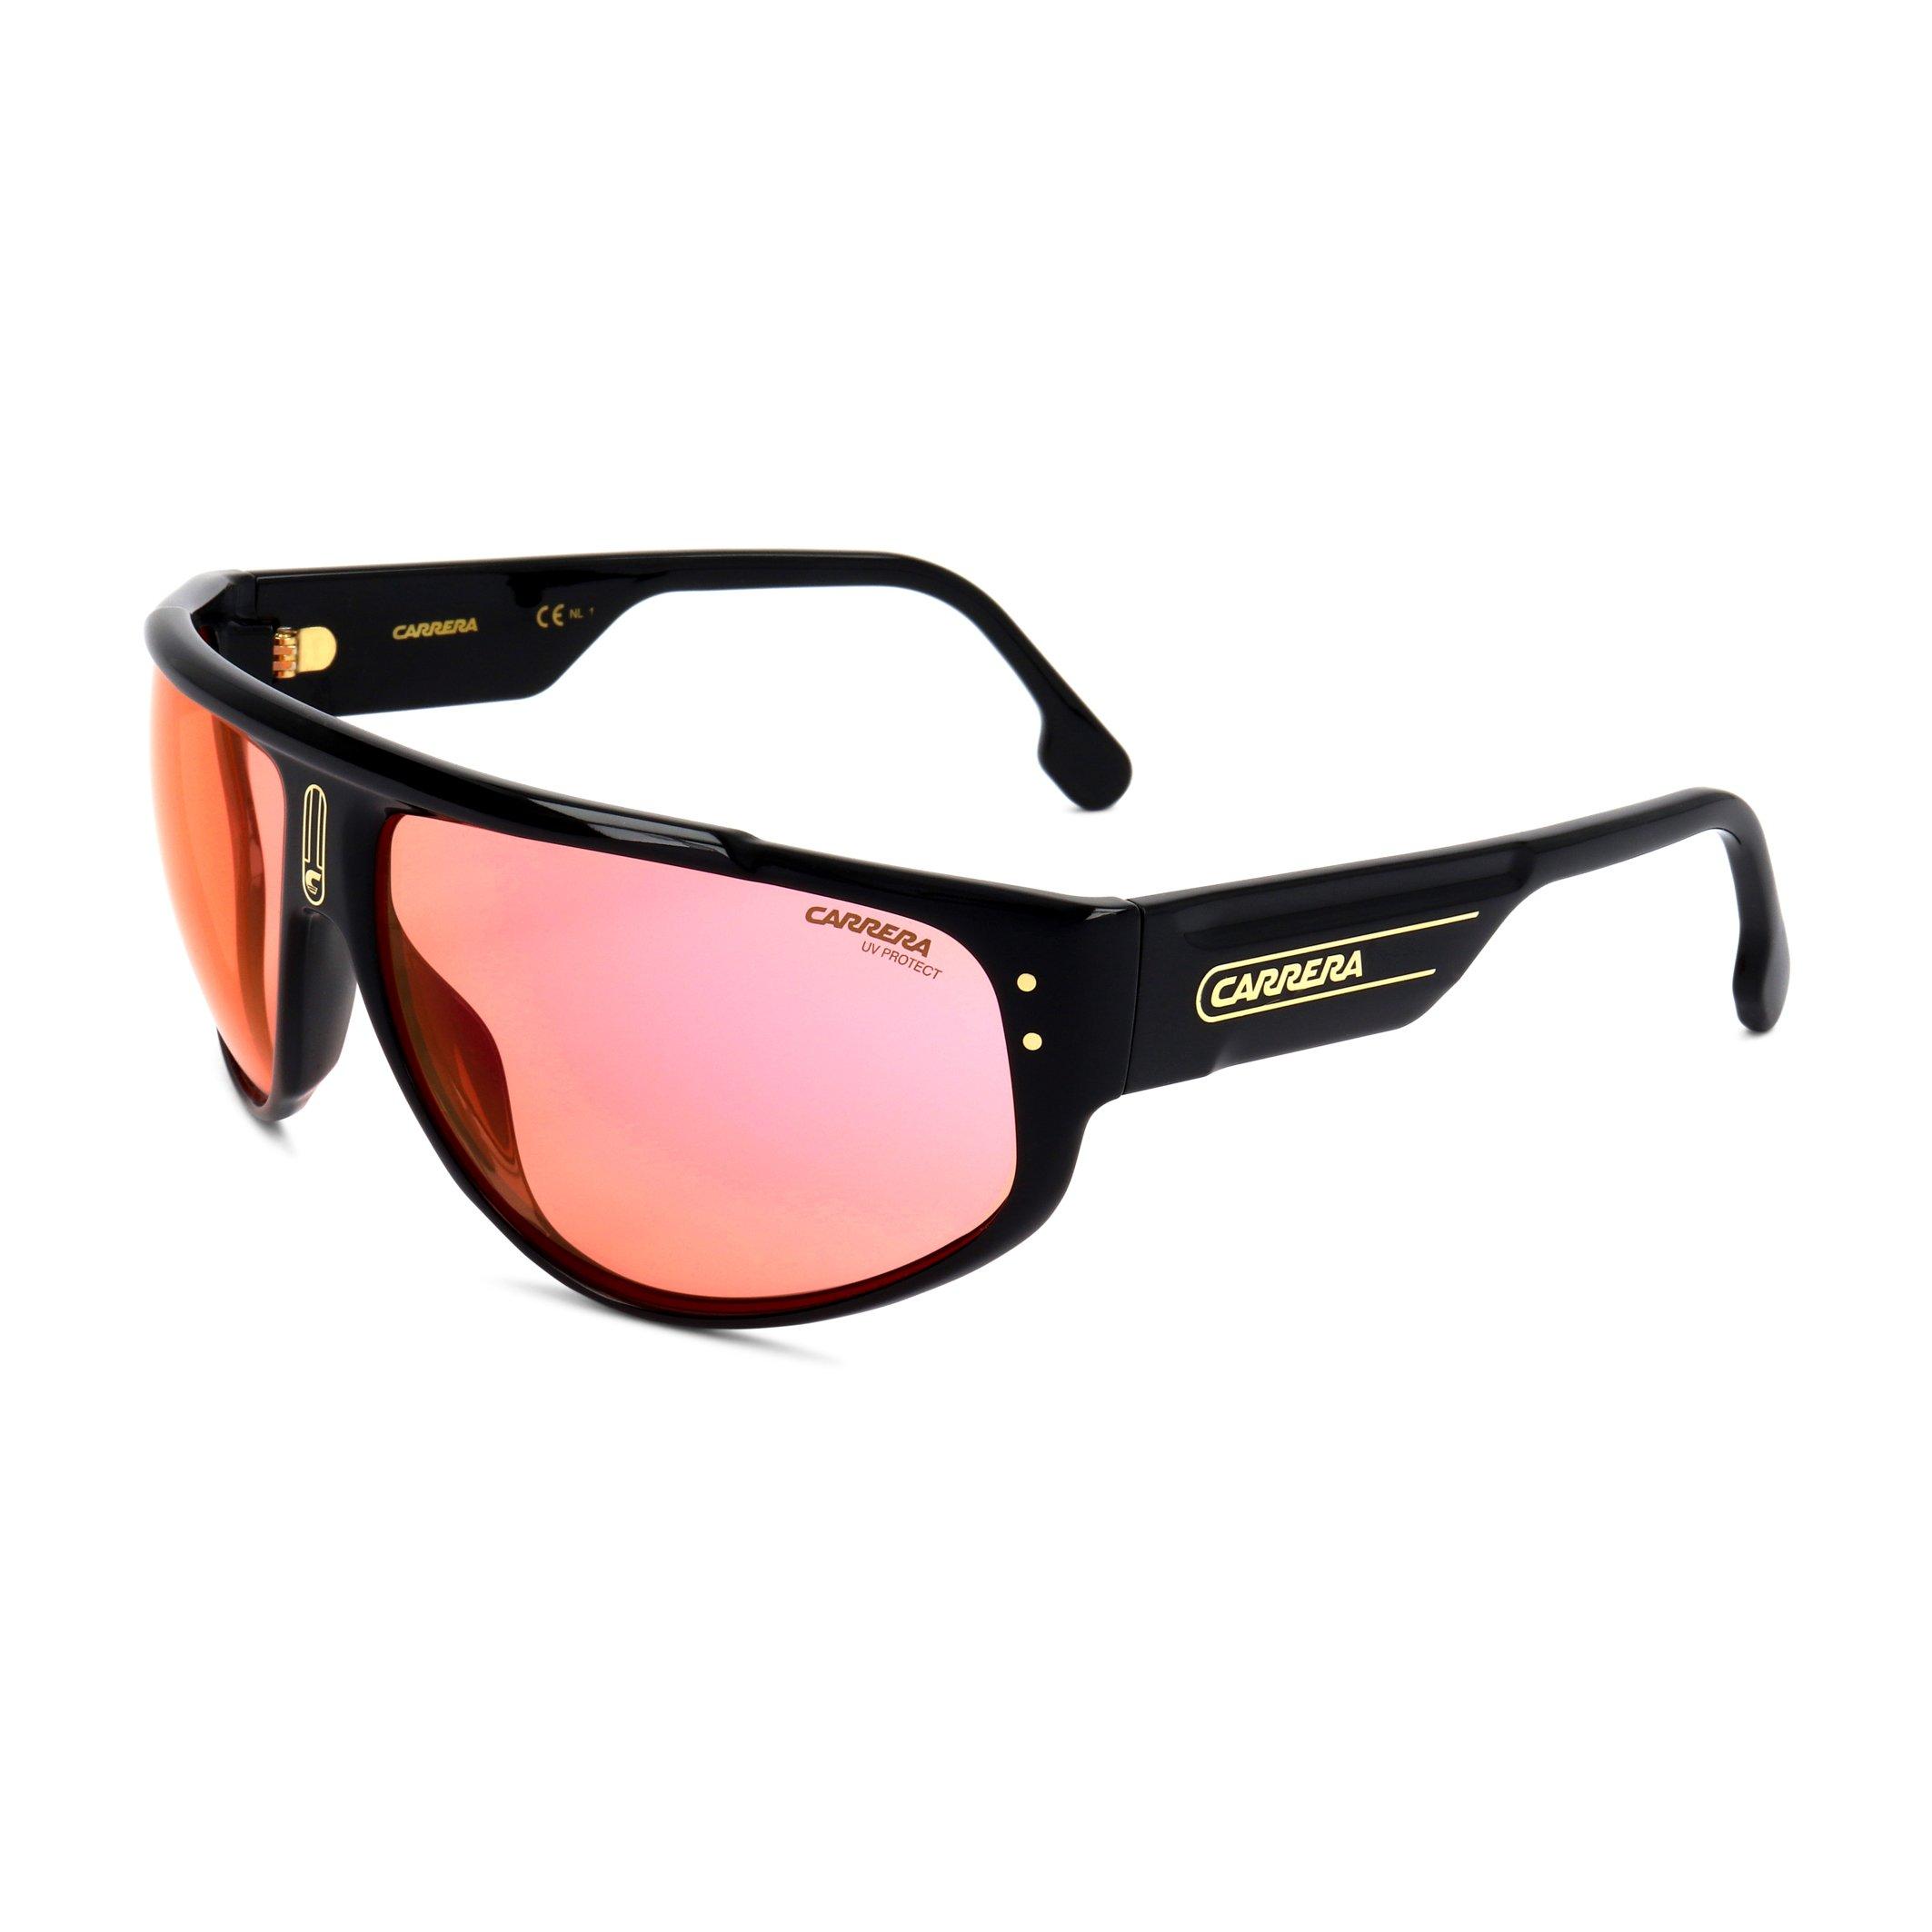 Carrera Unisex Sunglasses Black 1029S - black-3 NOSIZE